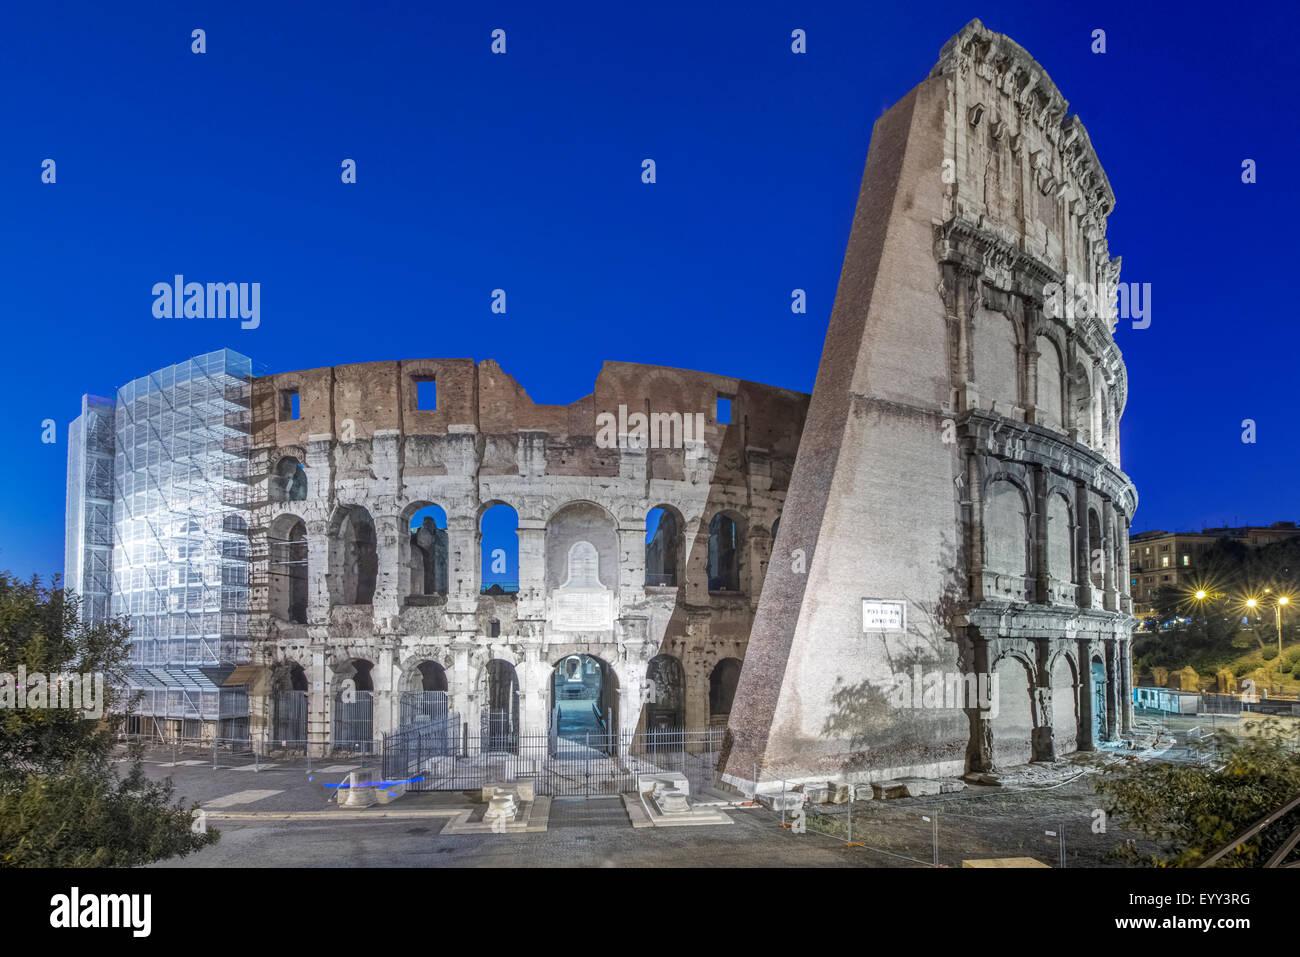 Coliseum ruins illuminated at night, Rome, Italy - Stock Image